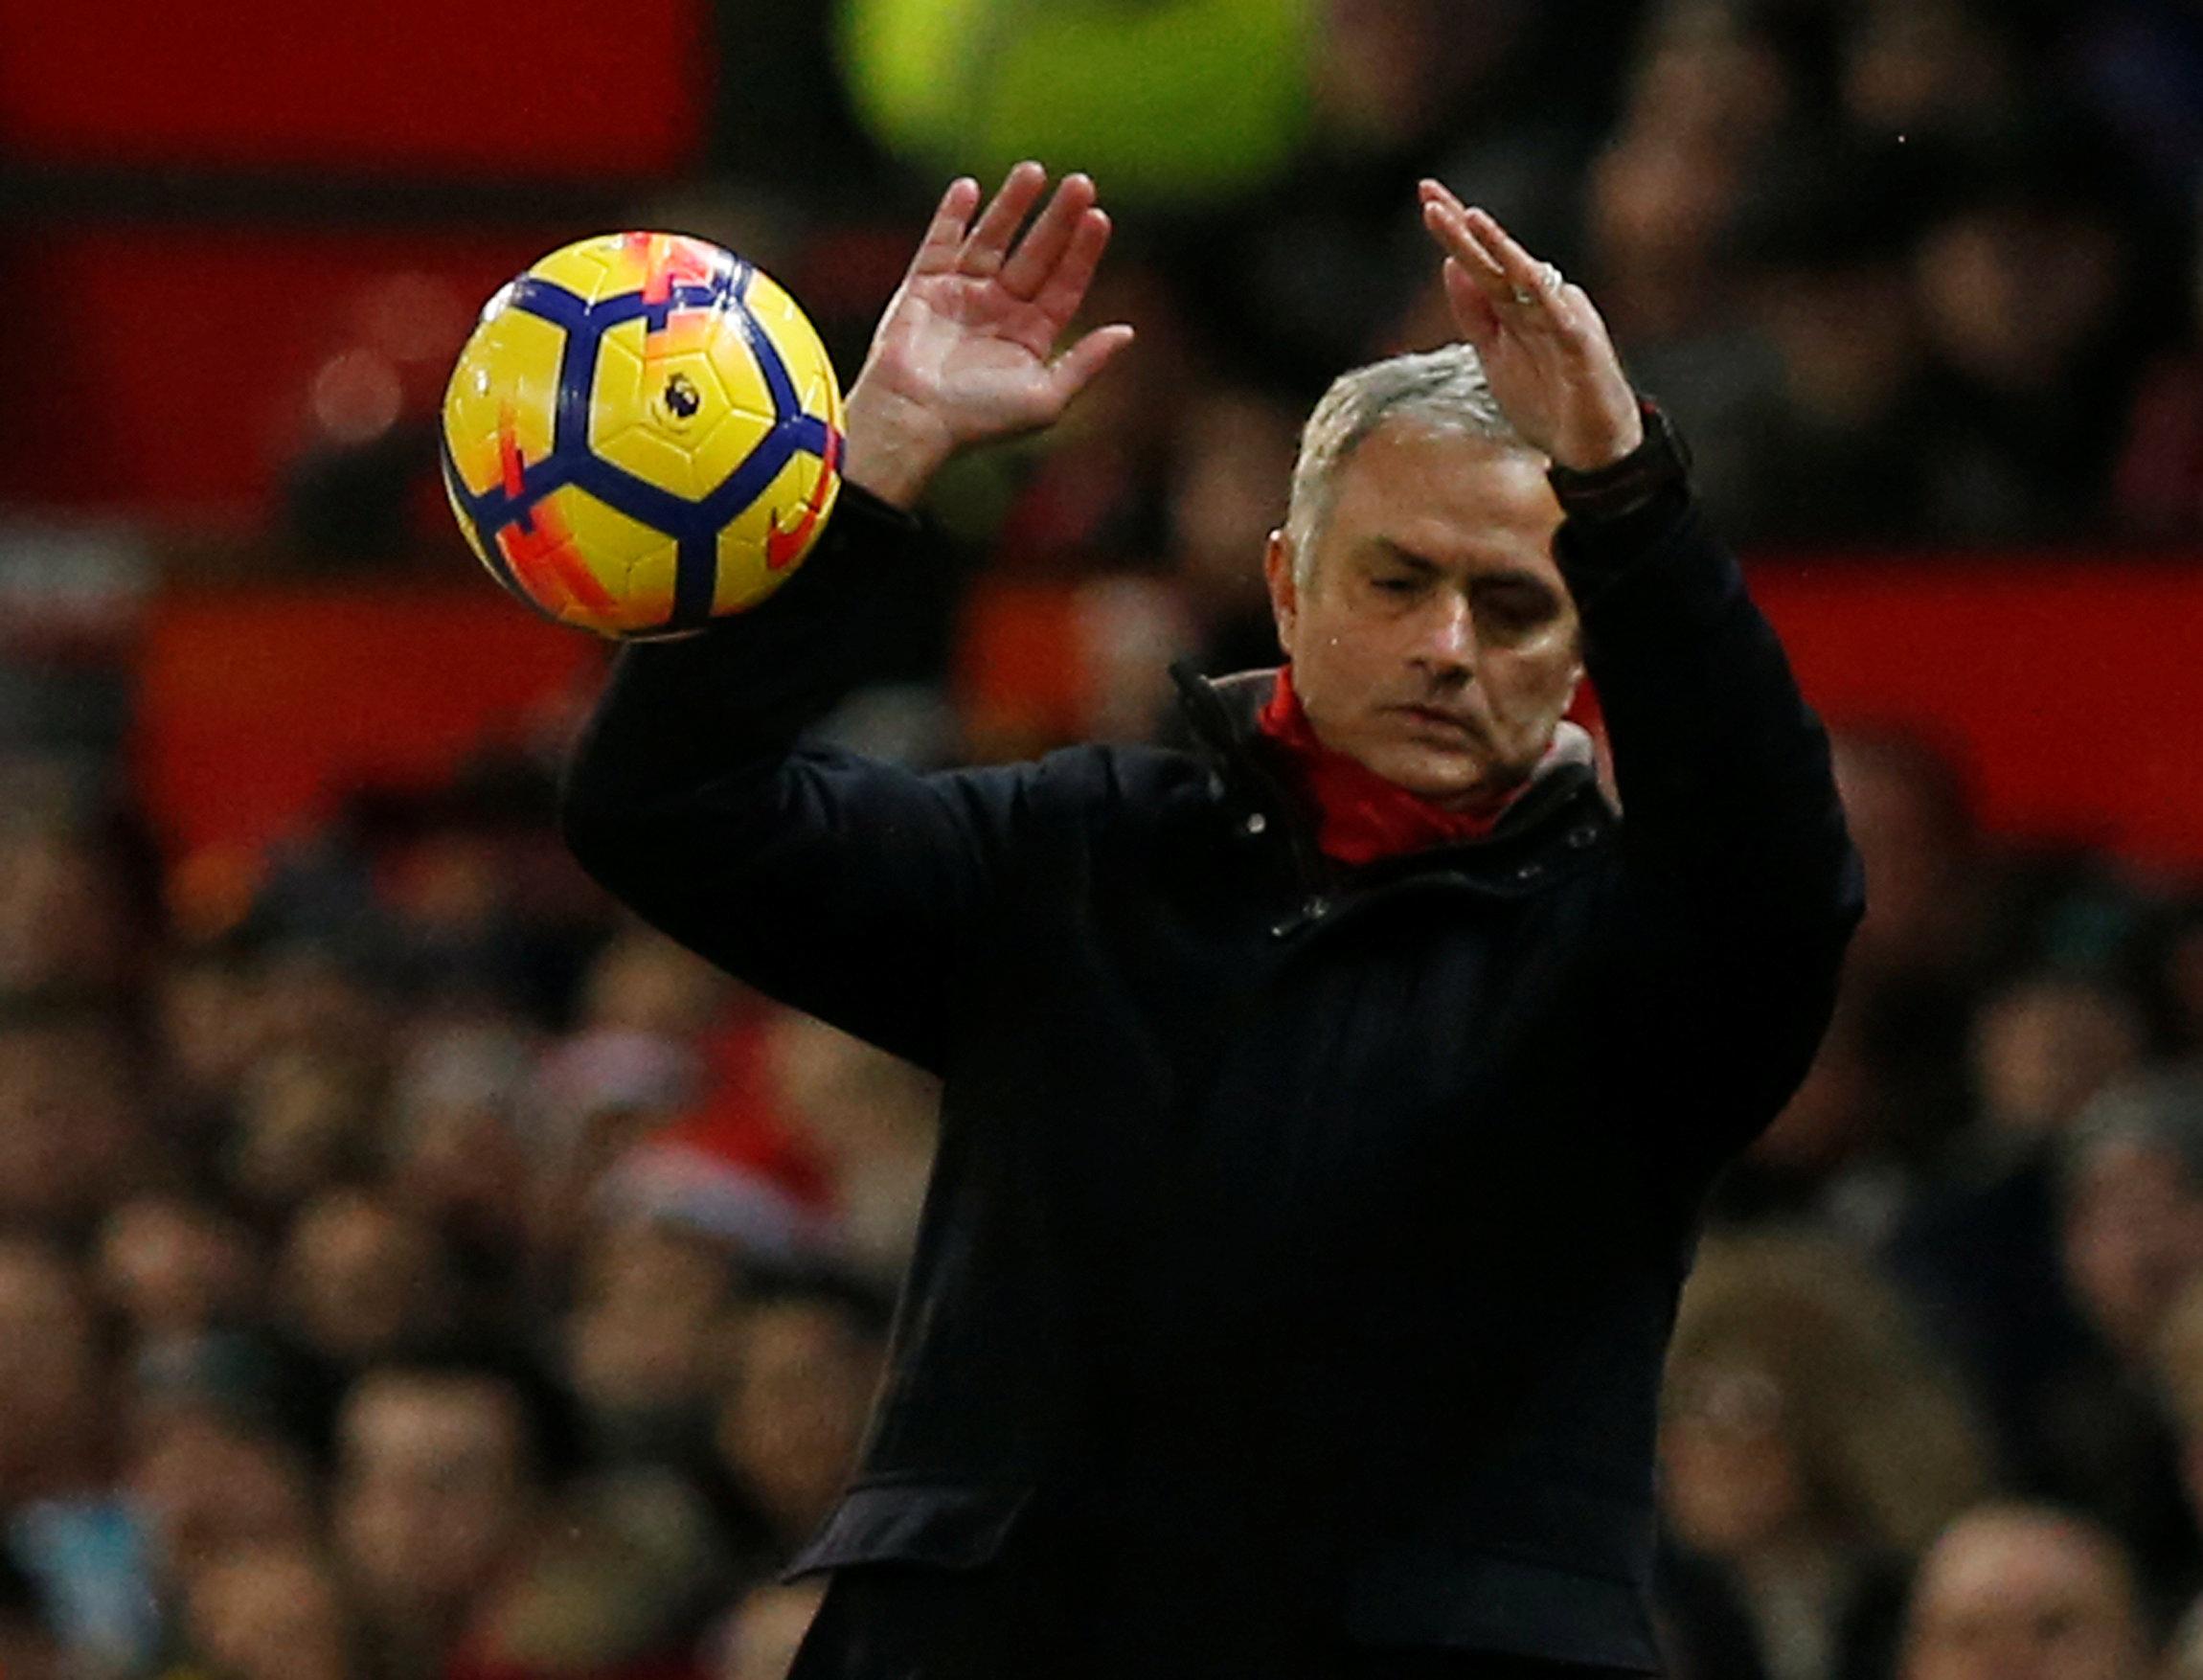 Giao thừa đầy áp lực với Mourinho